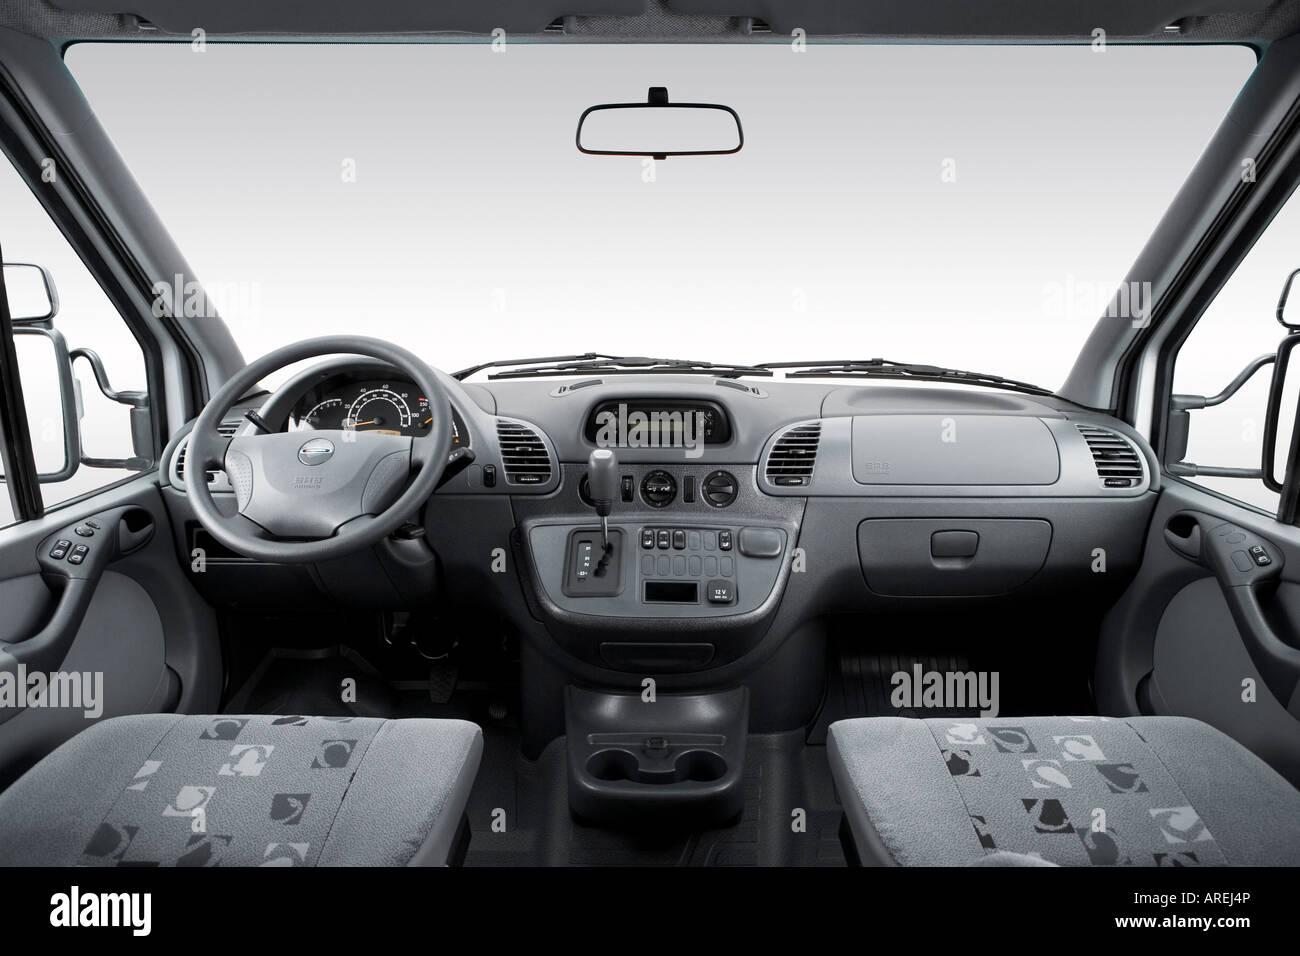 2006 Dodge Sprinter 2500 in Silver - Dashboard, center console, gear